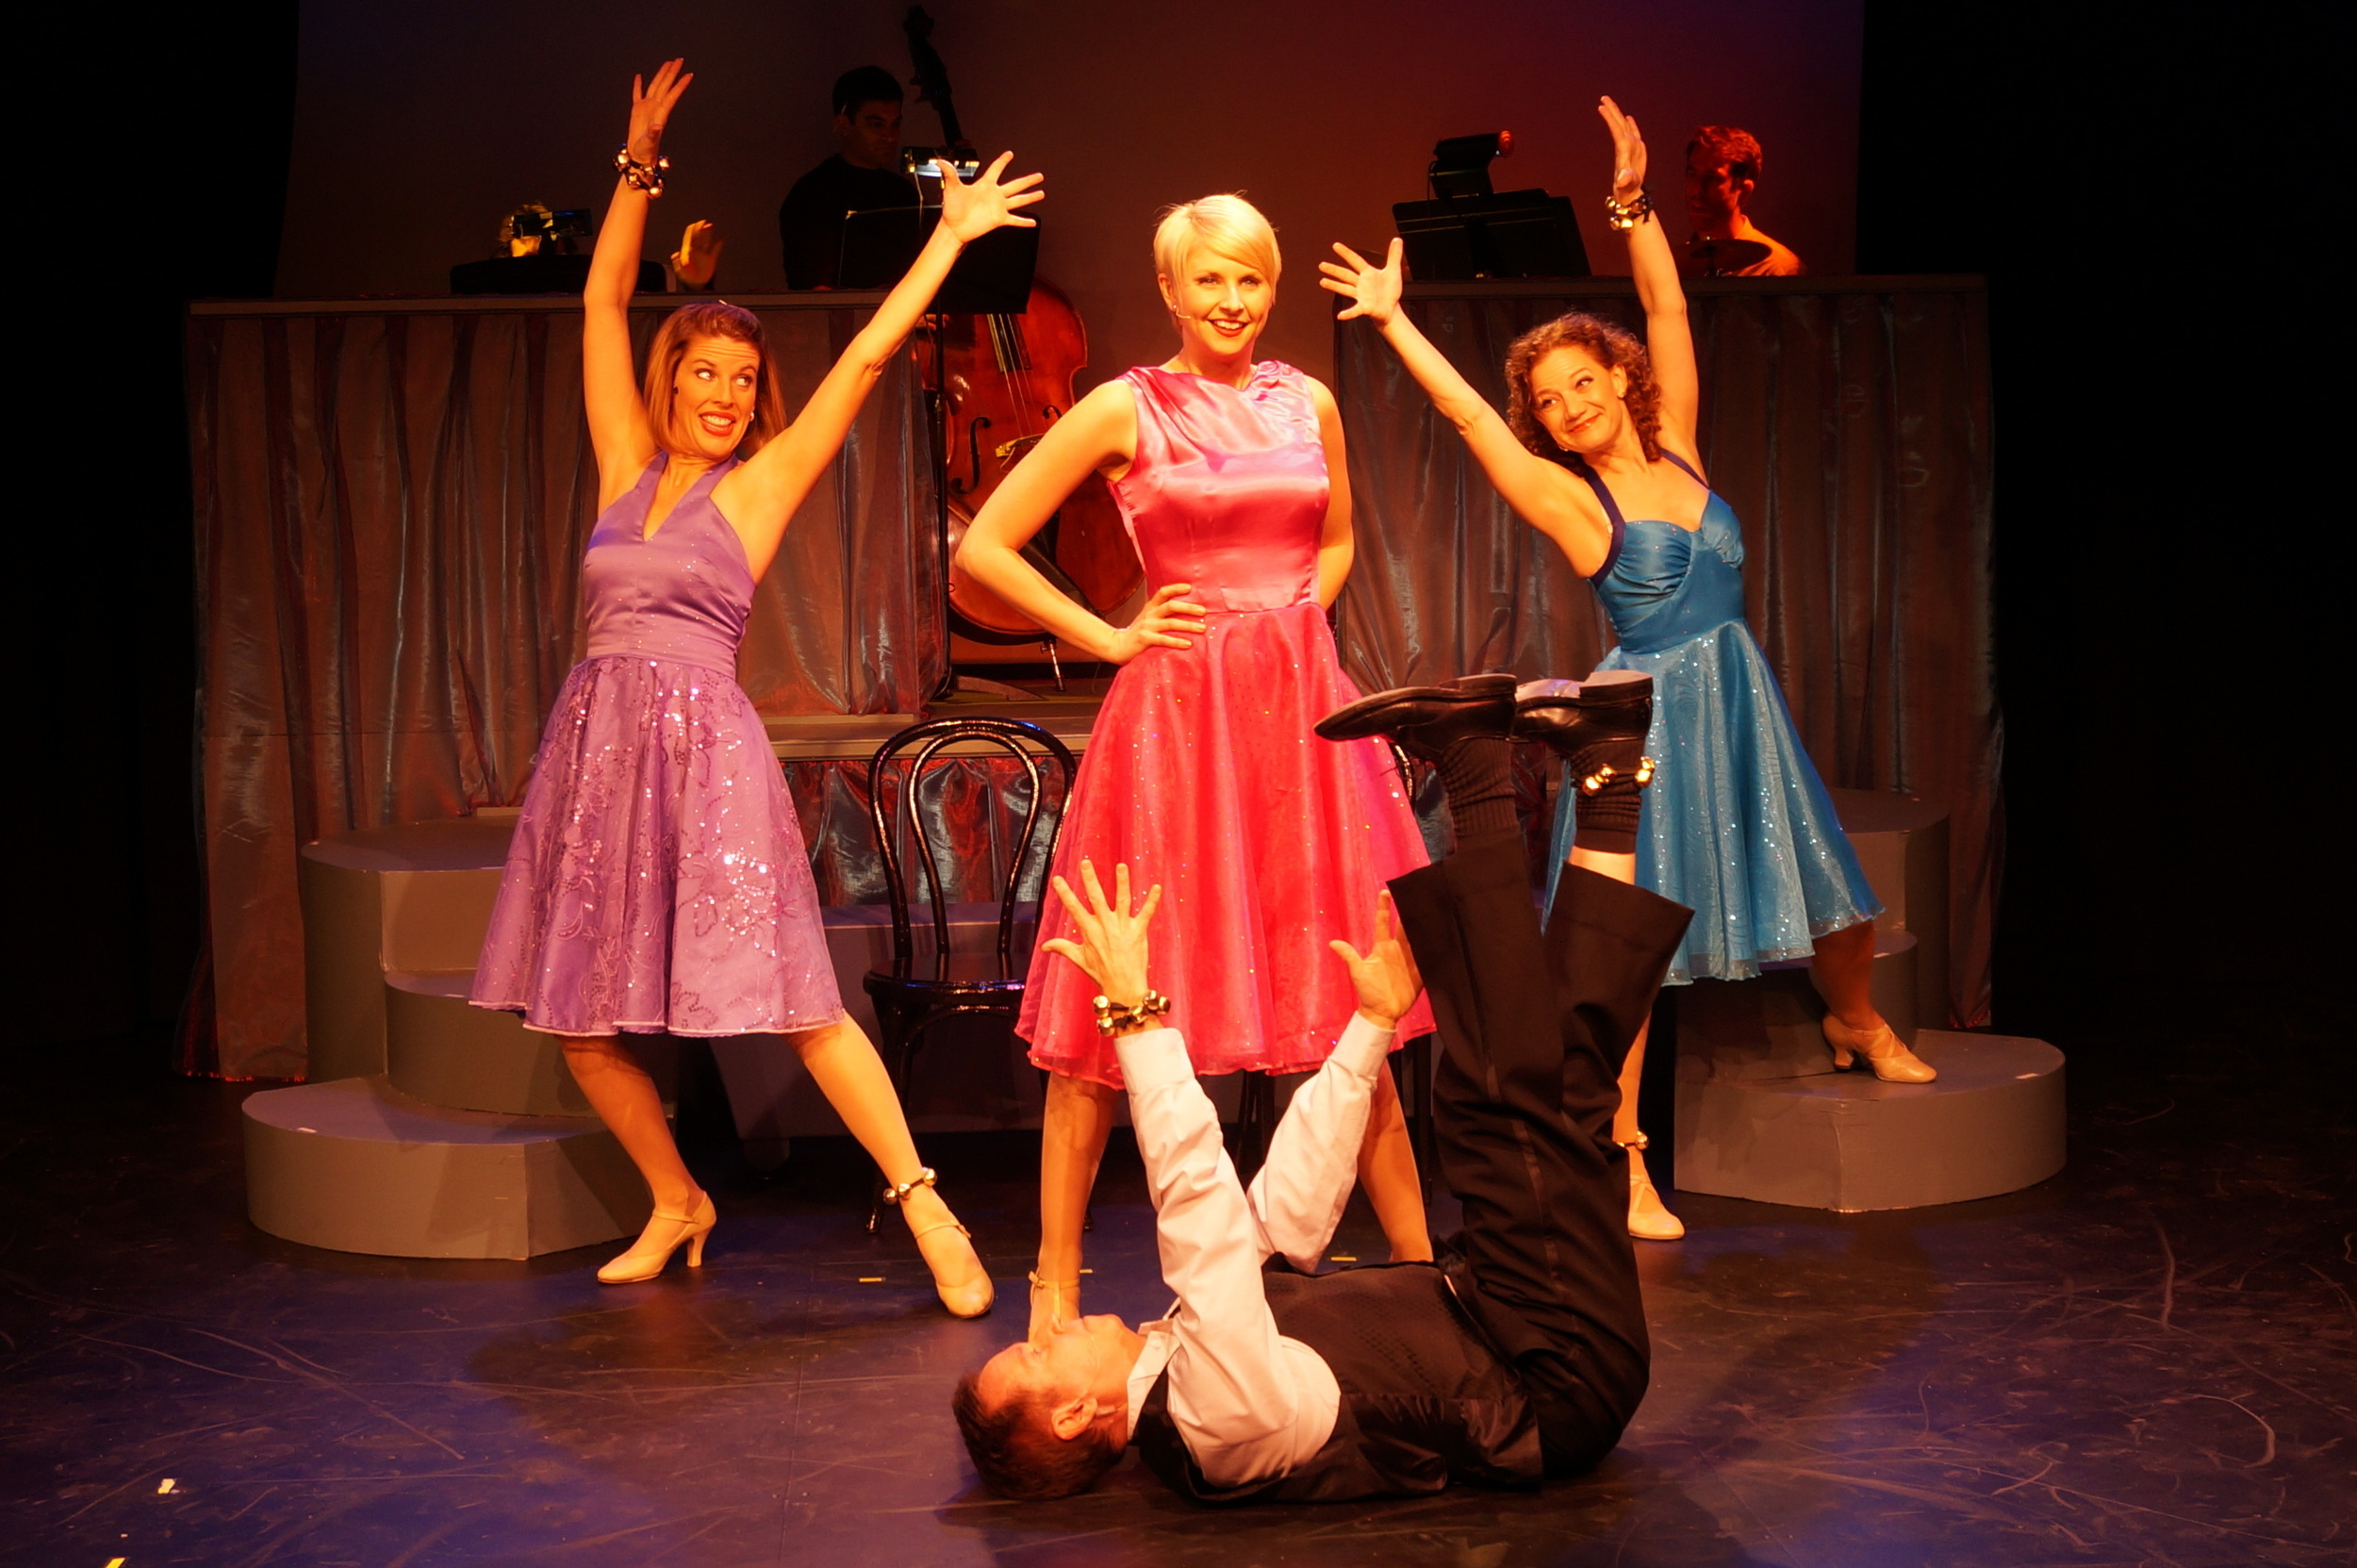 (Clockwise from left:) Trisha Rapier, Melissa Carlile-Price, Kathy Calahan and Eric Scott Kincaid